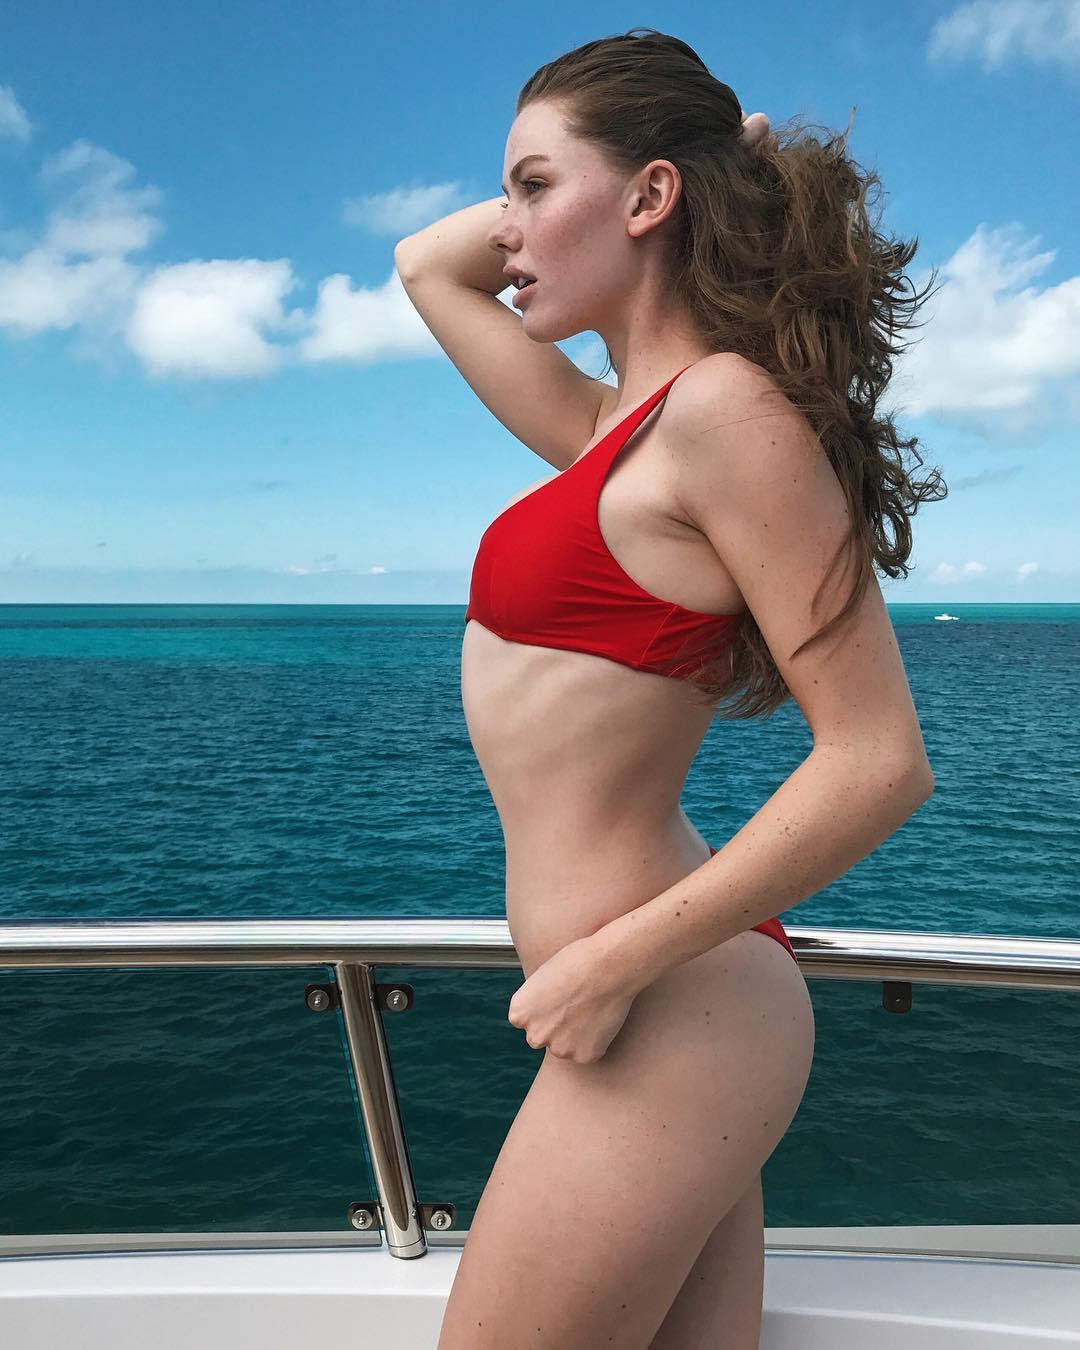 Selfie McKenna Berkley nudes (87 photos), Sexy, Leaked, Boobs, panties 2018